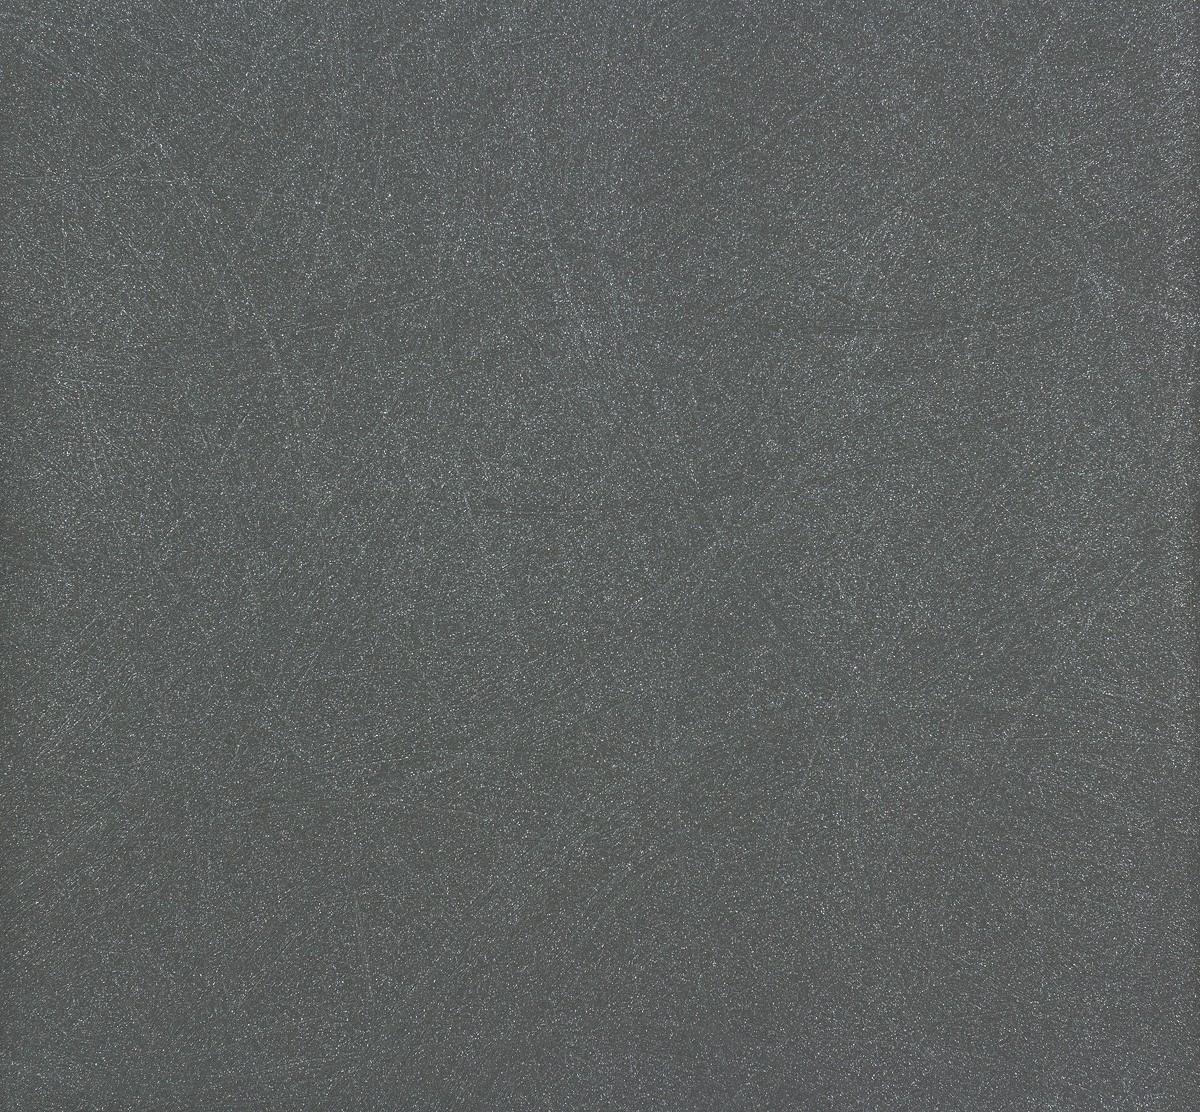 Vliestapete anthrazit uni shiny chic rasch 403664 for Graue tapete mit muster